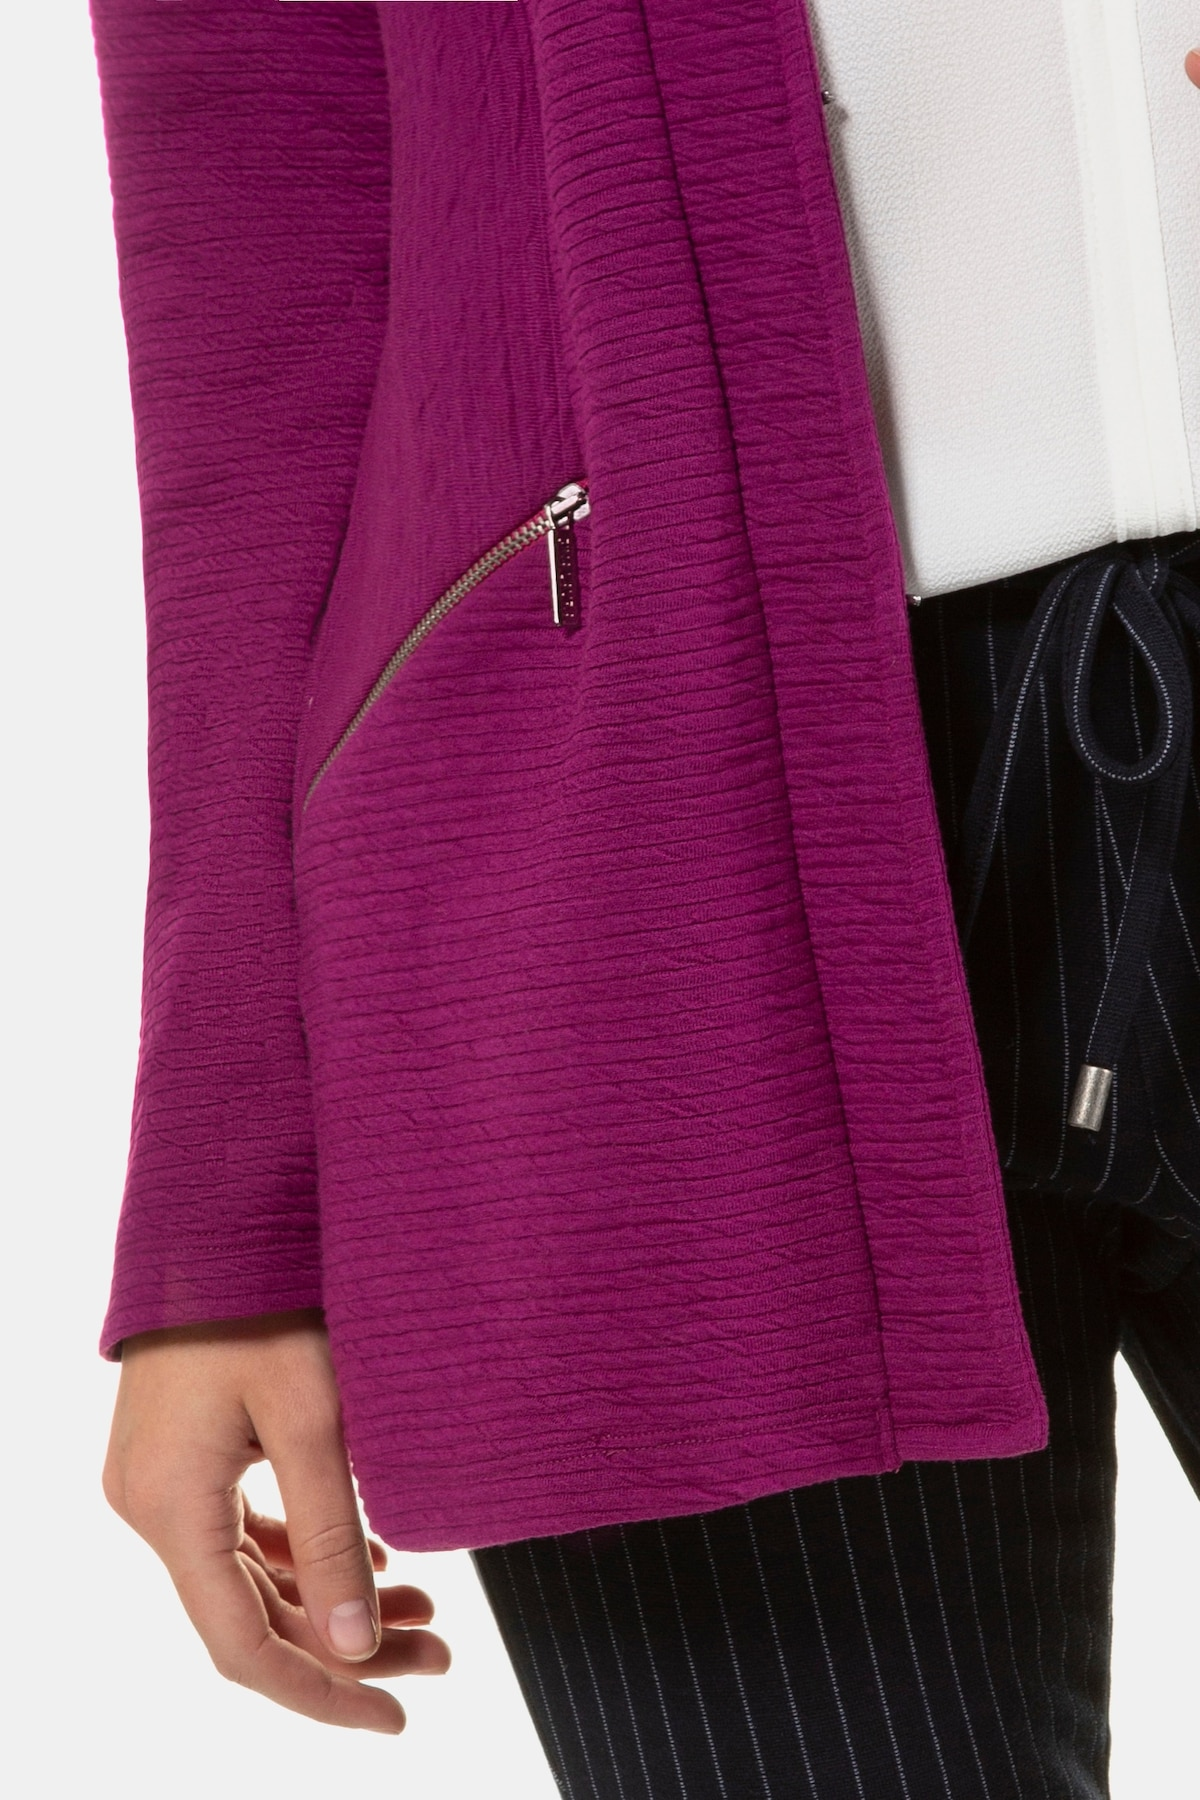 Beliebt Frauen Bekleidung Gina Laura Jacquardjacke in lila Zum Verkauf